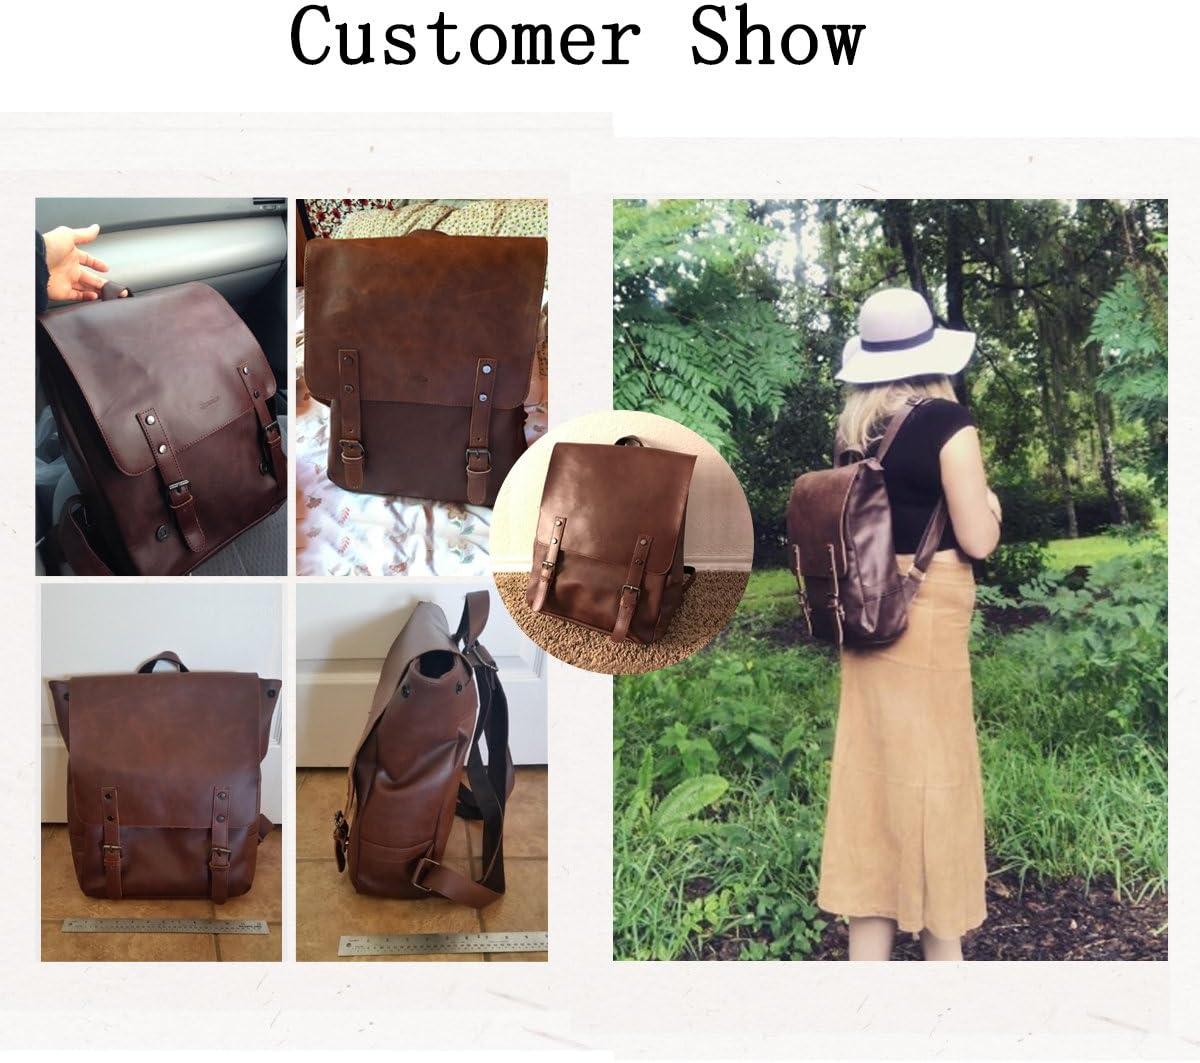 ZEBELLA Womens Leather Backpack Vintage Brown Travel Daypack College Bookbag-Light Brown